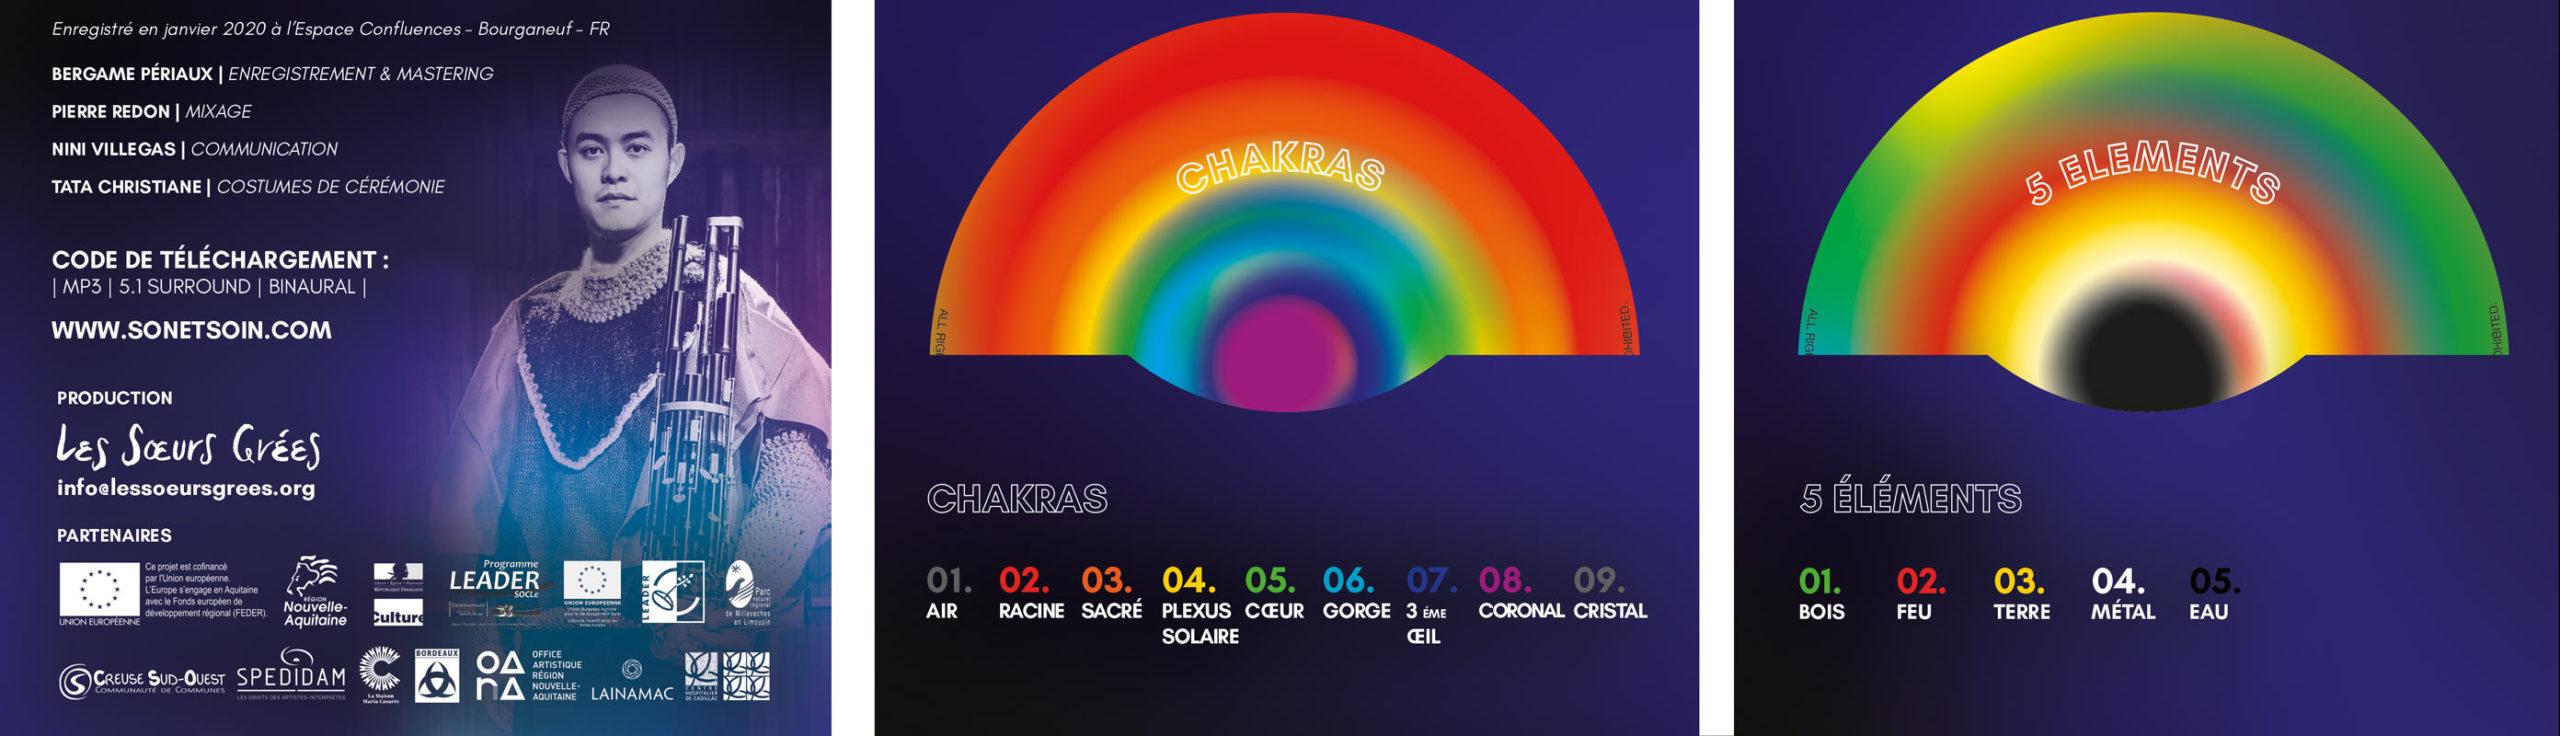 ALBUM CHAKRAS & 5 ÉLÉMENTS - PIERRE REDON & ENSEMBLE 9